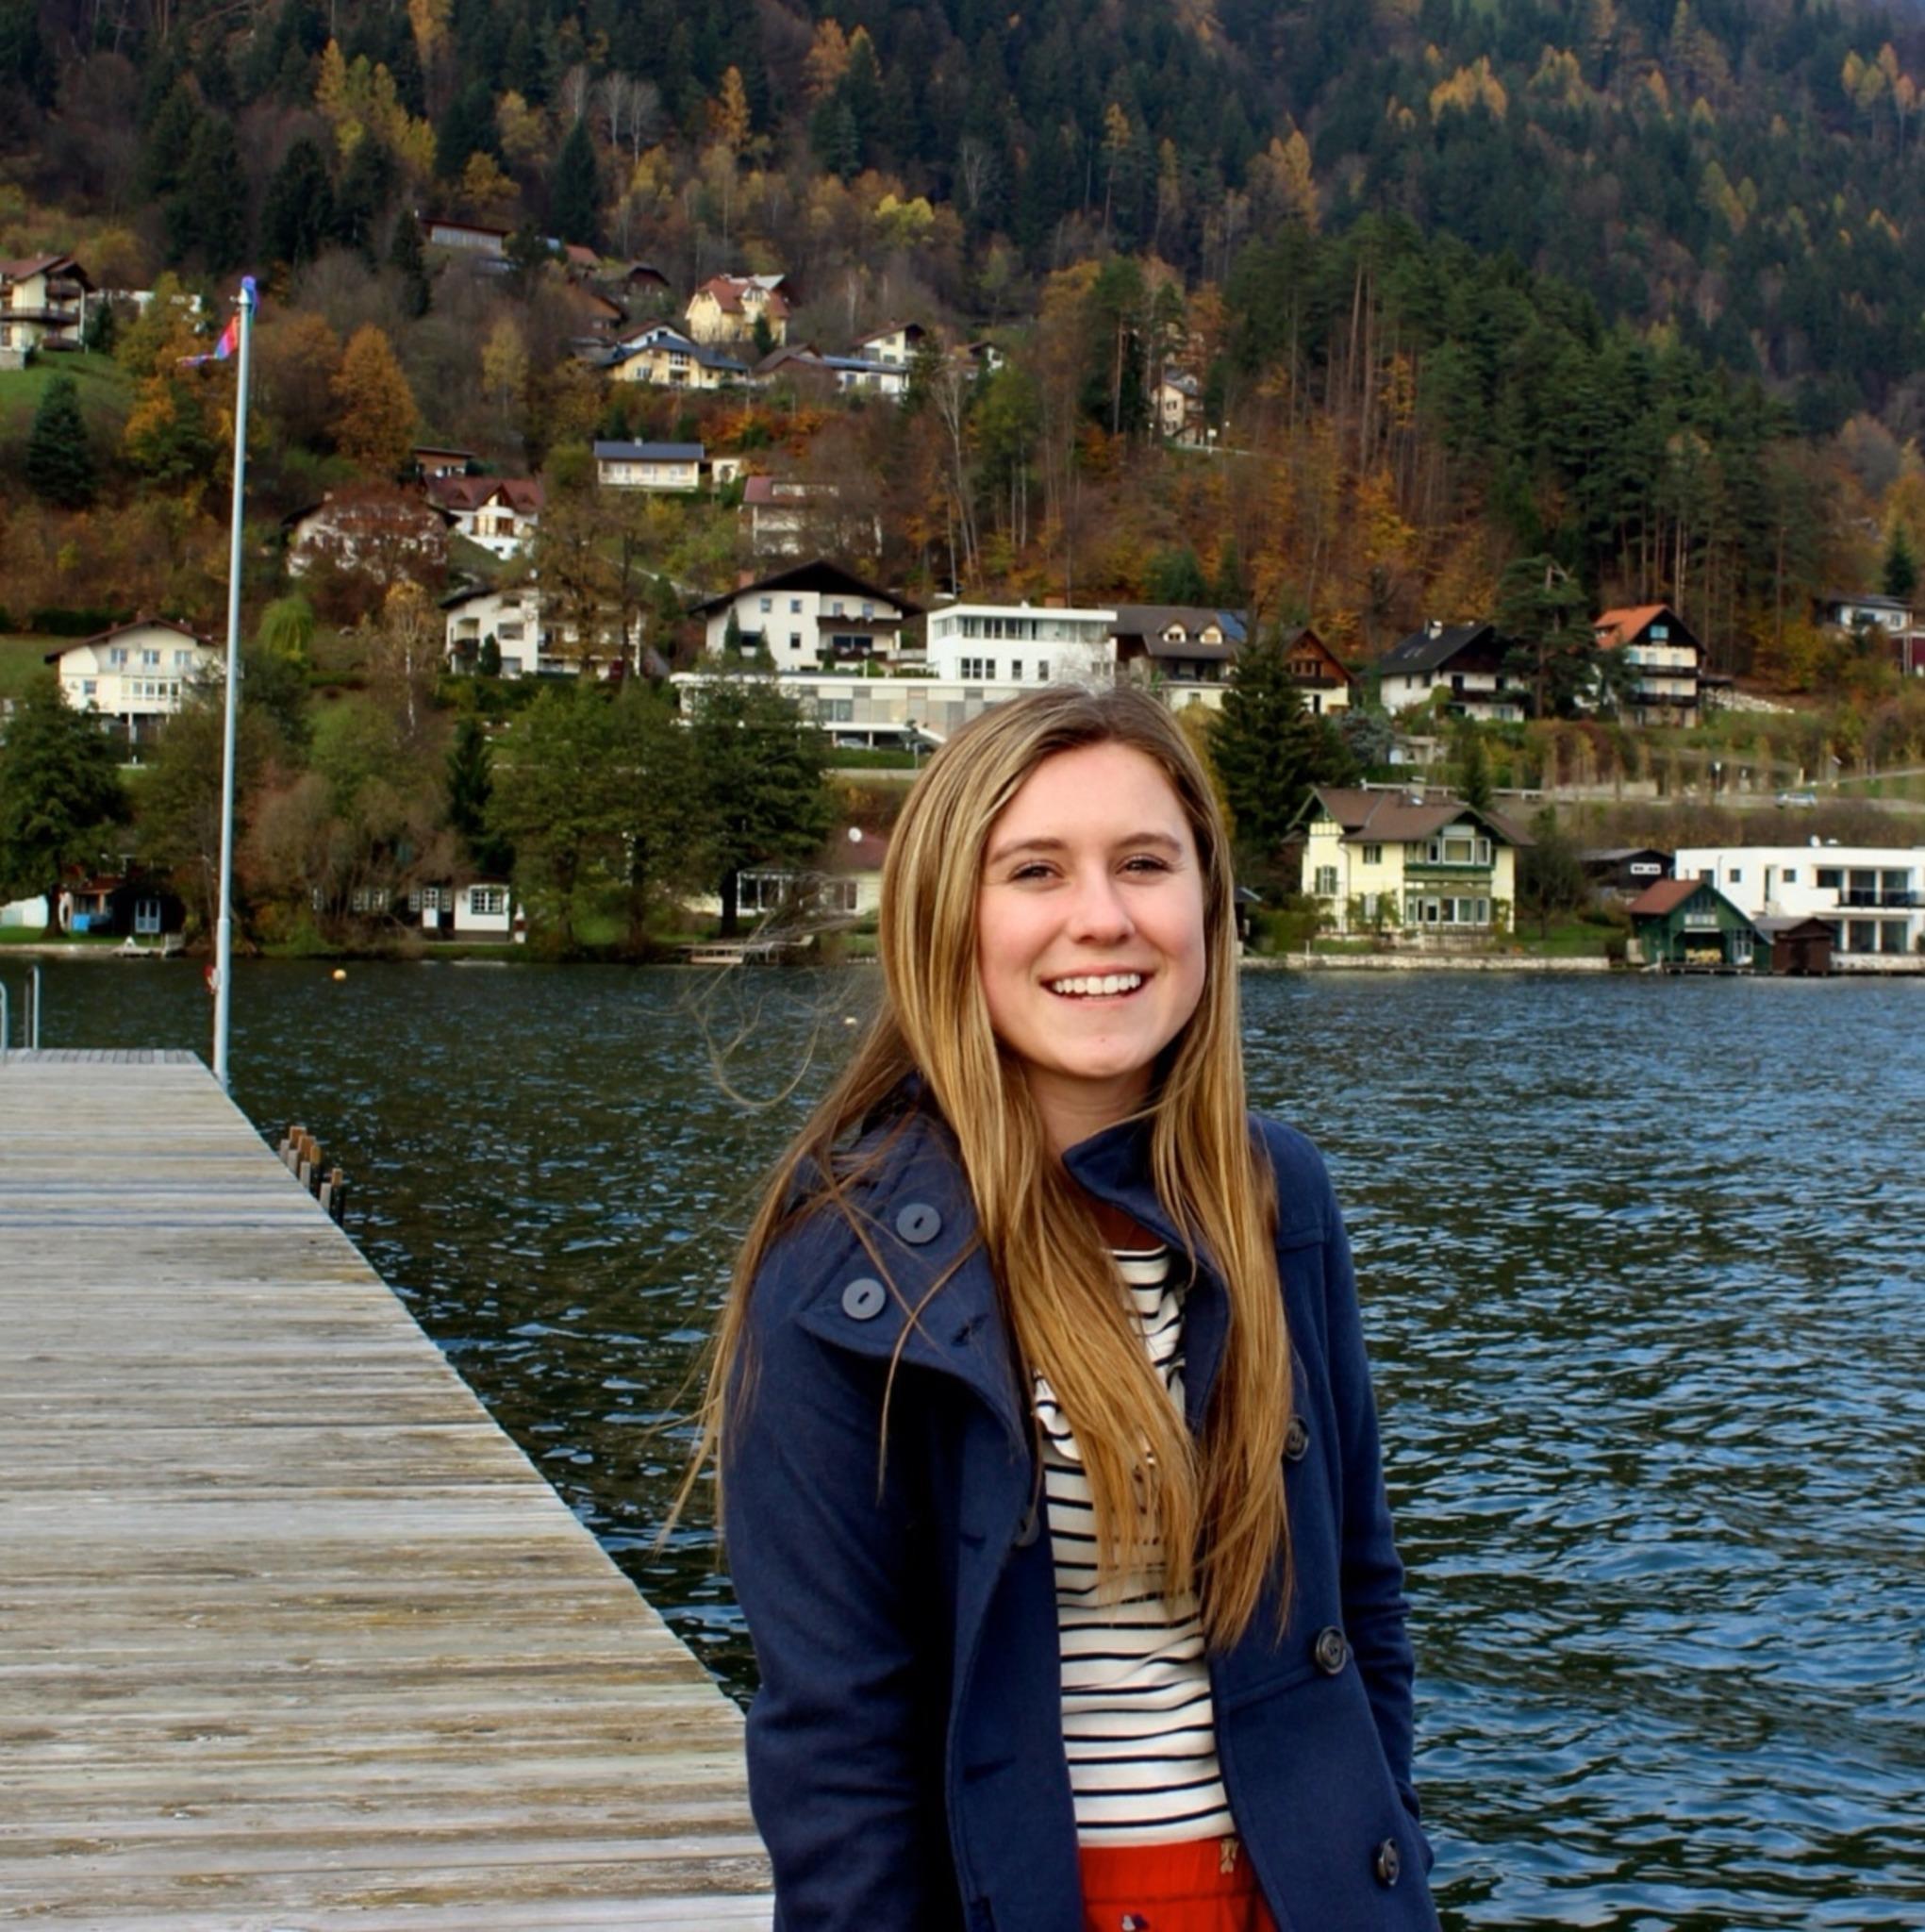 Landskron casual dating - Oberhaag single kennenlernen